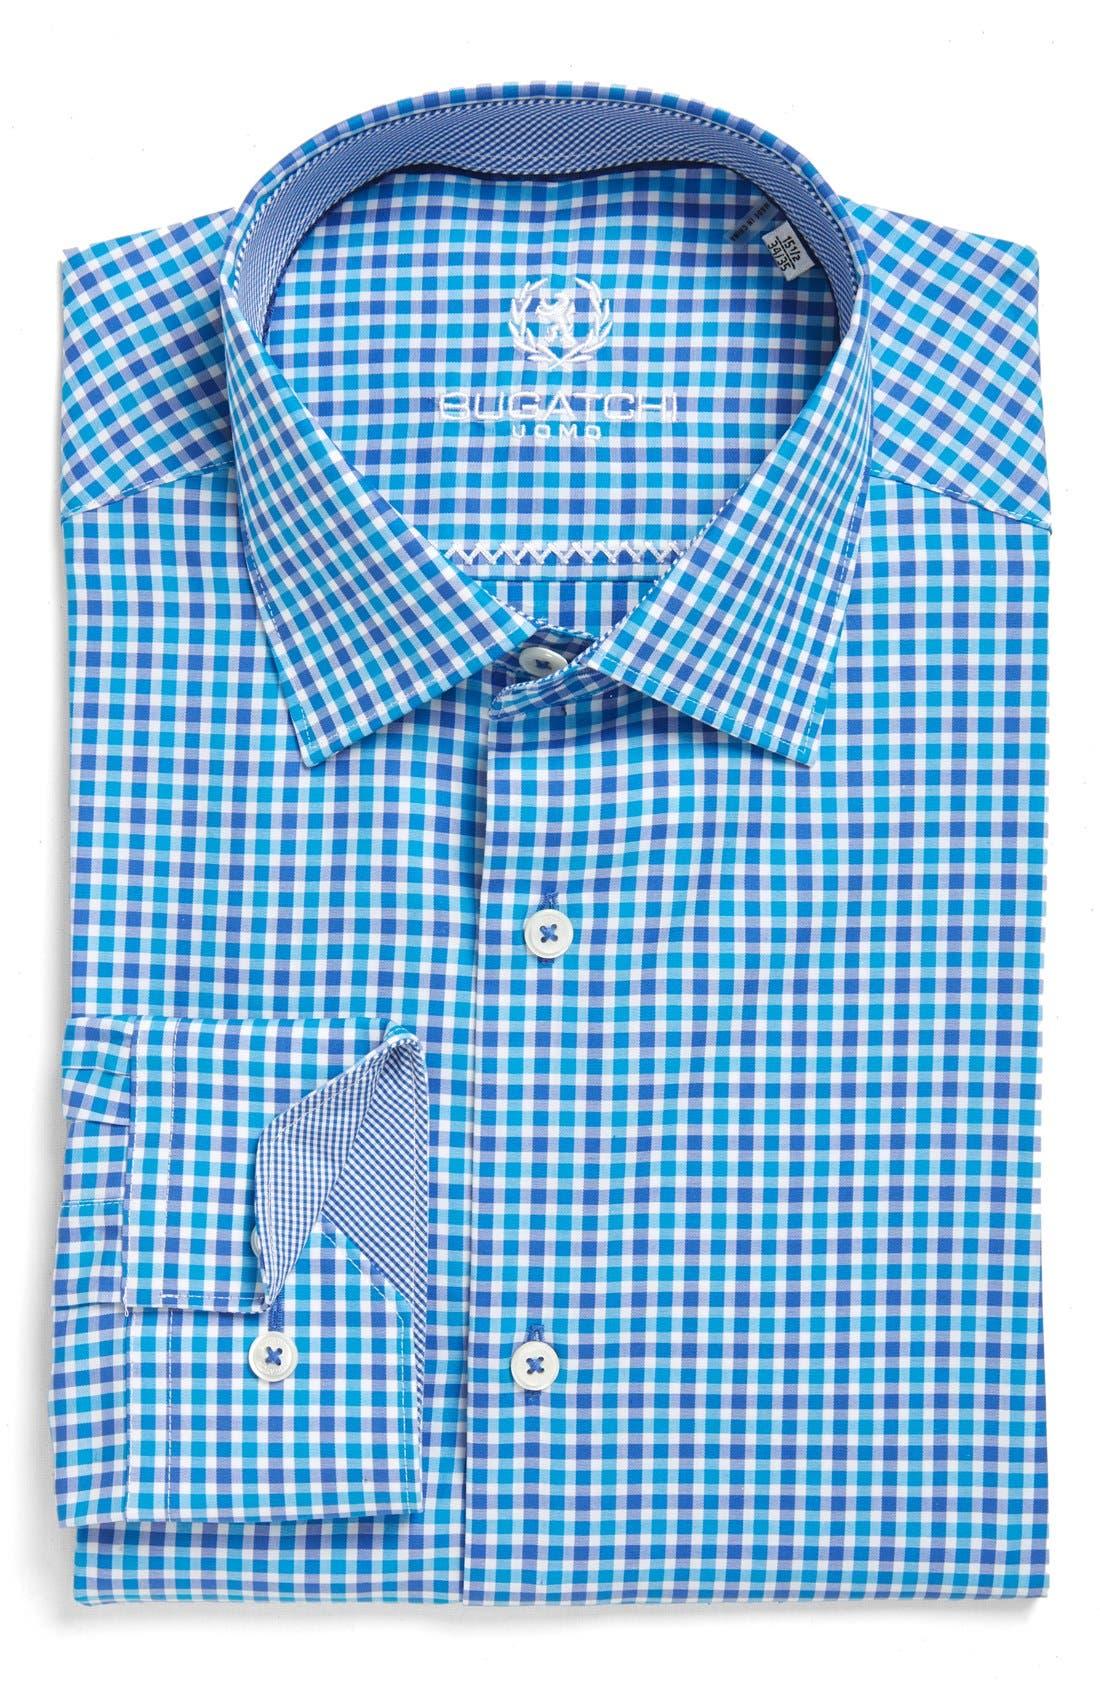 Trim Fit Check Dress Shirt,                             Main thumbnail 1, color,                             Turquoise